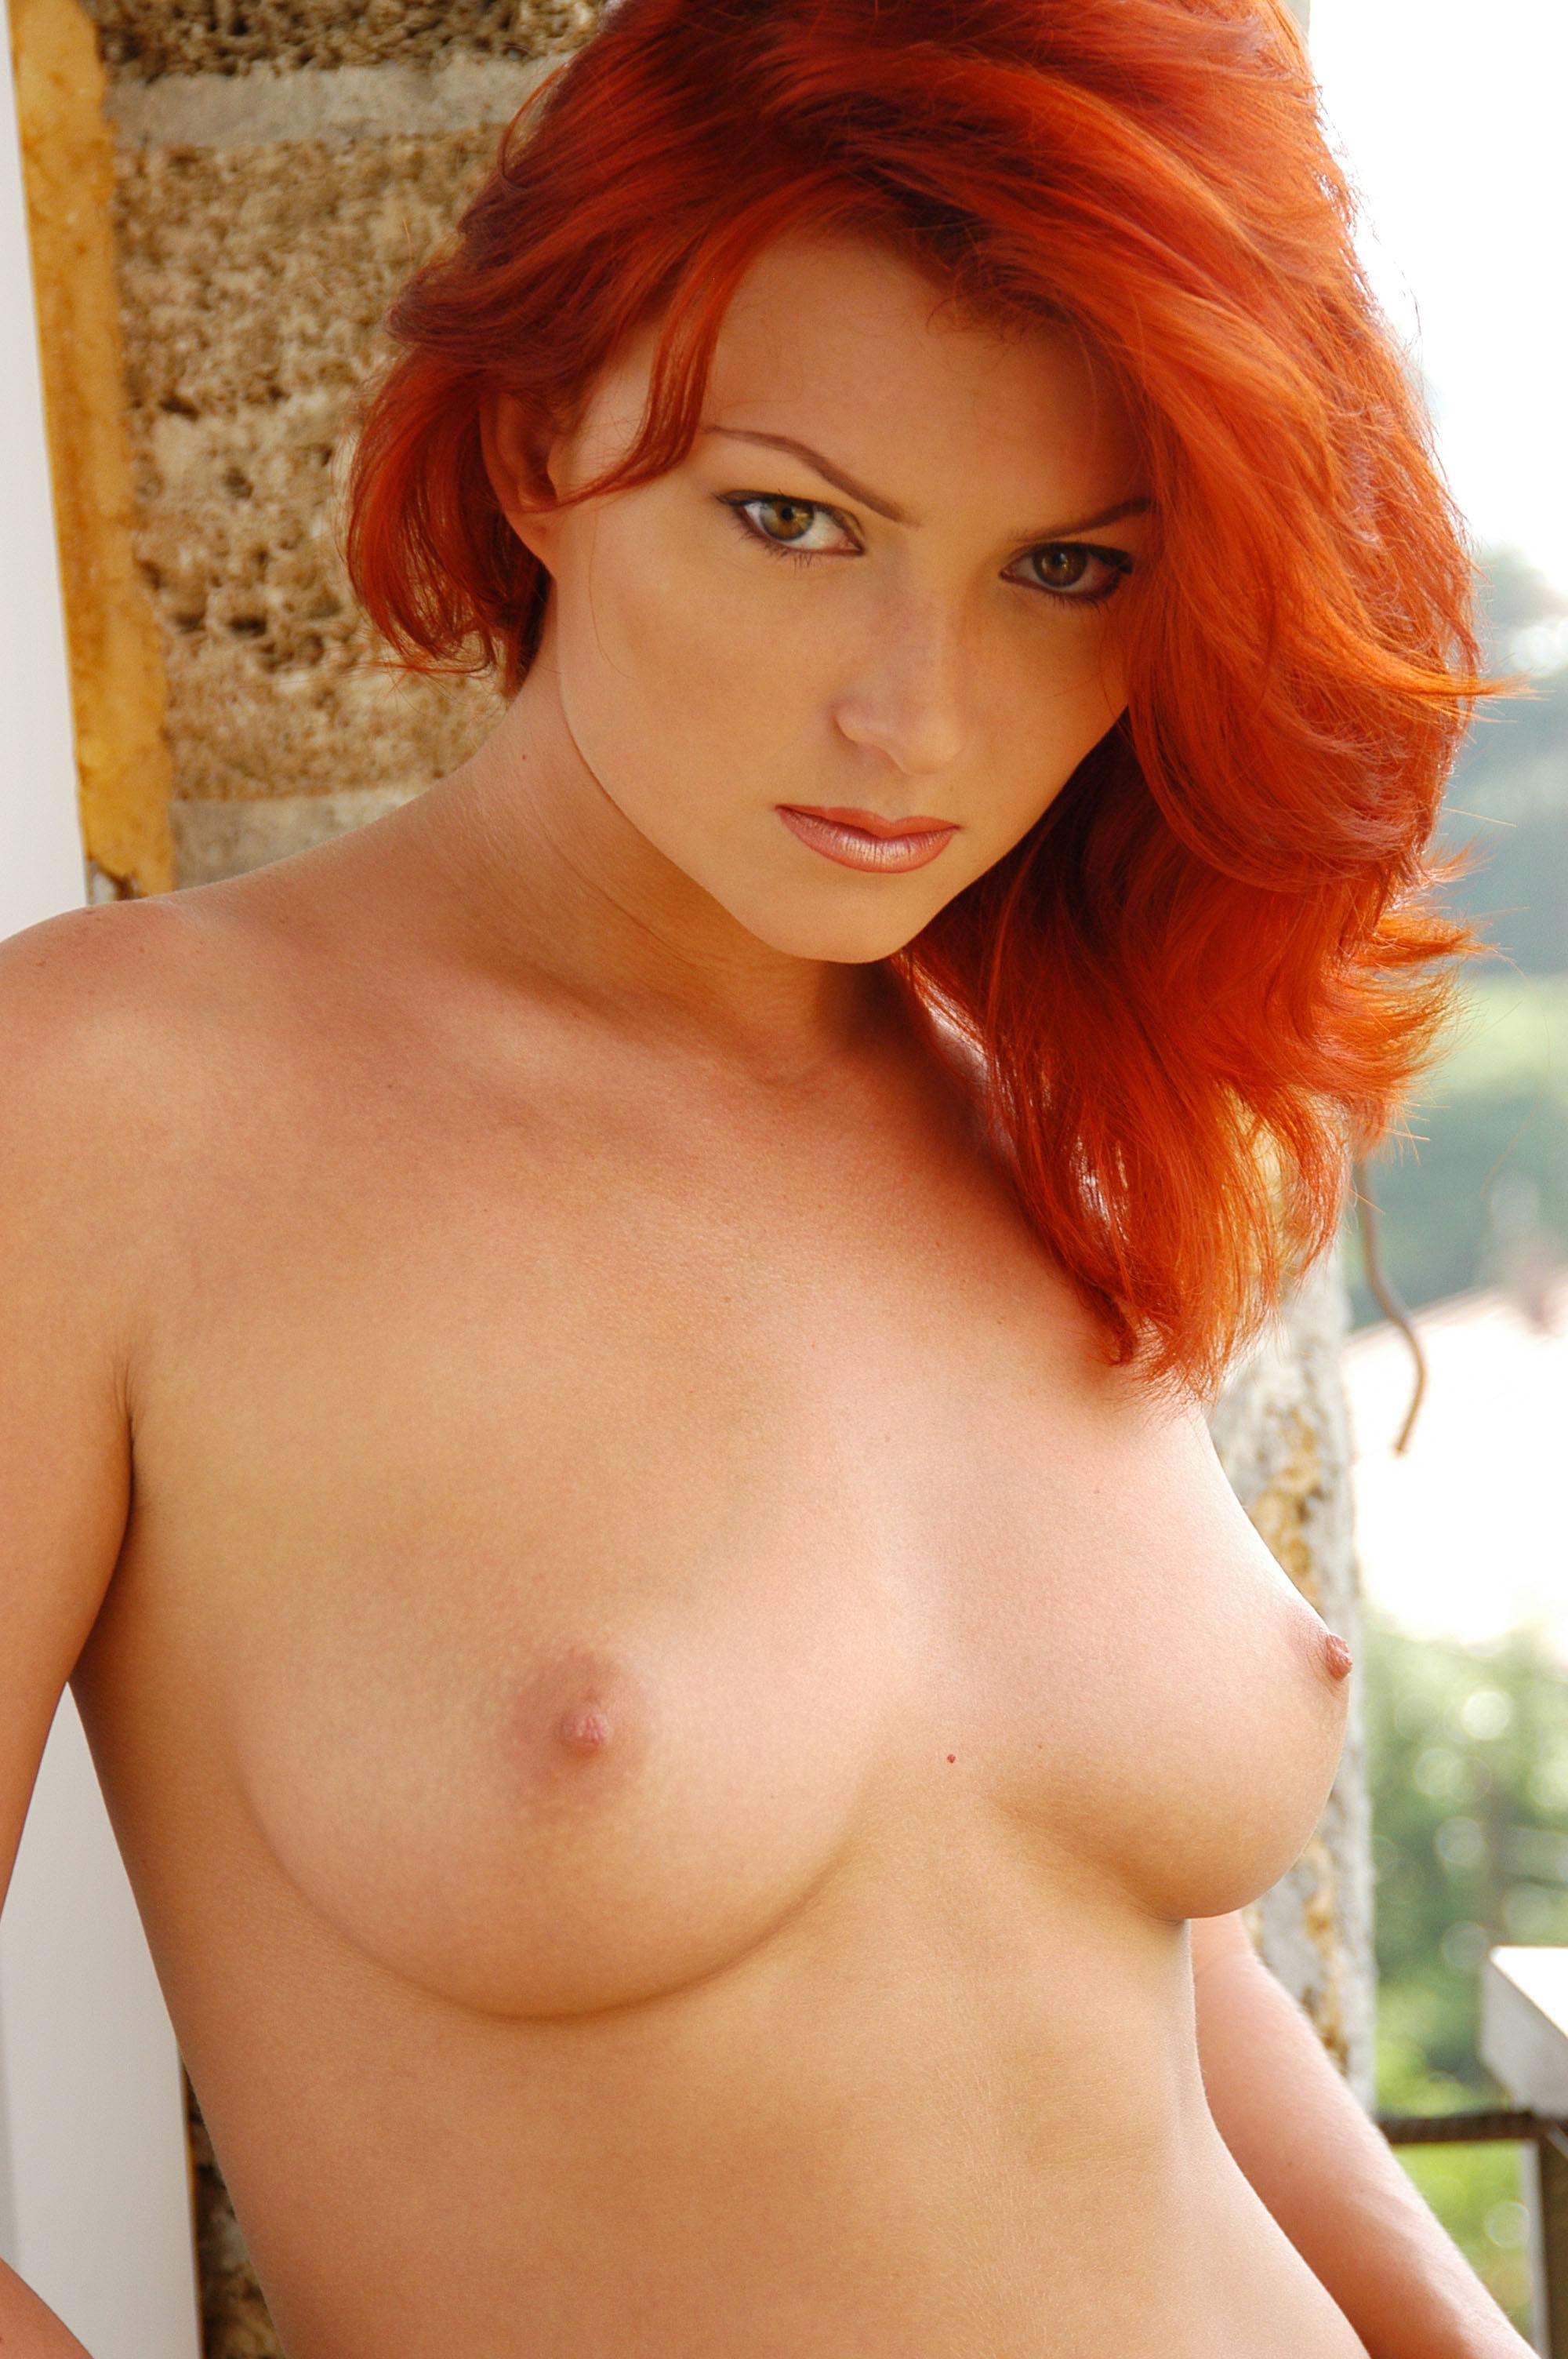 redheads-43